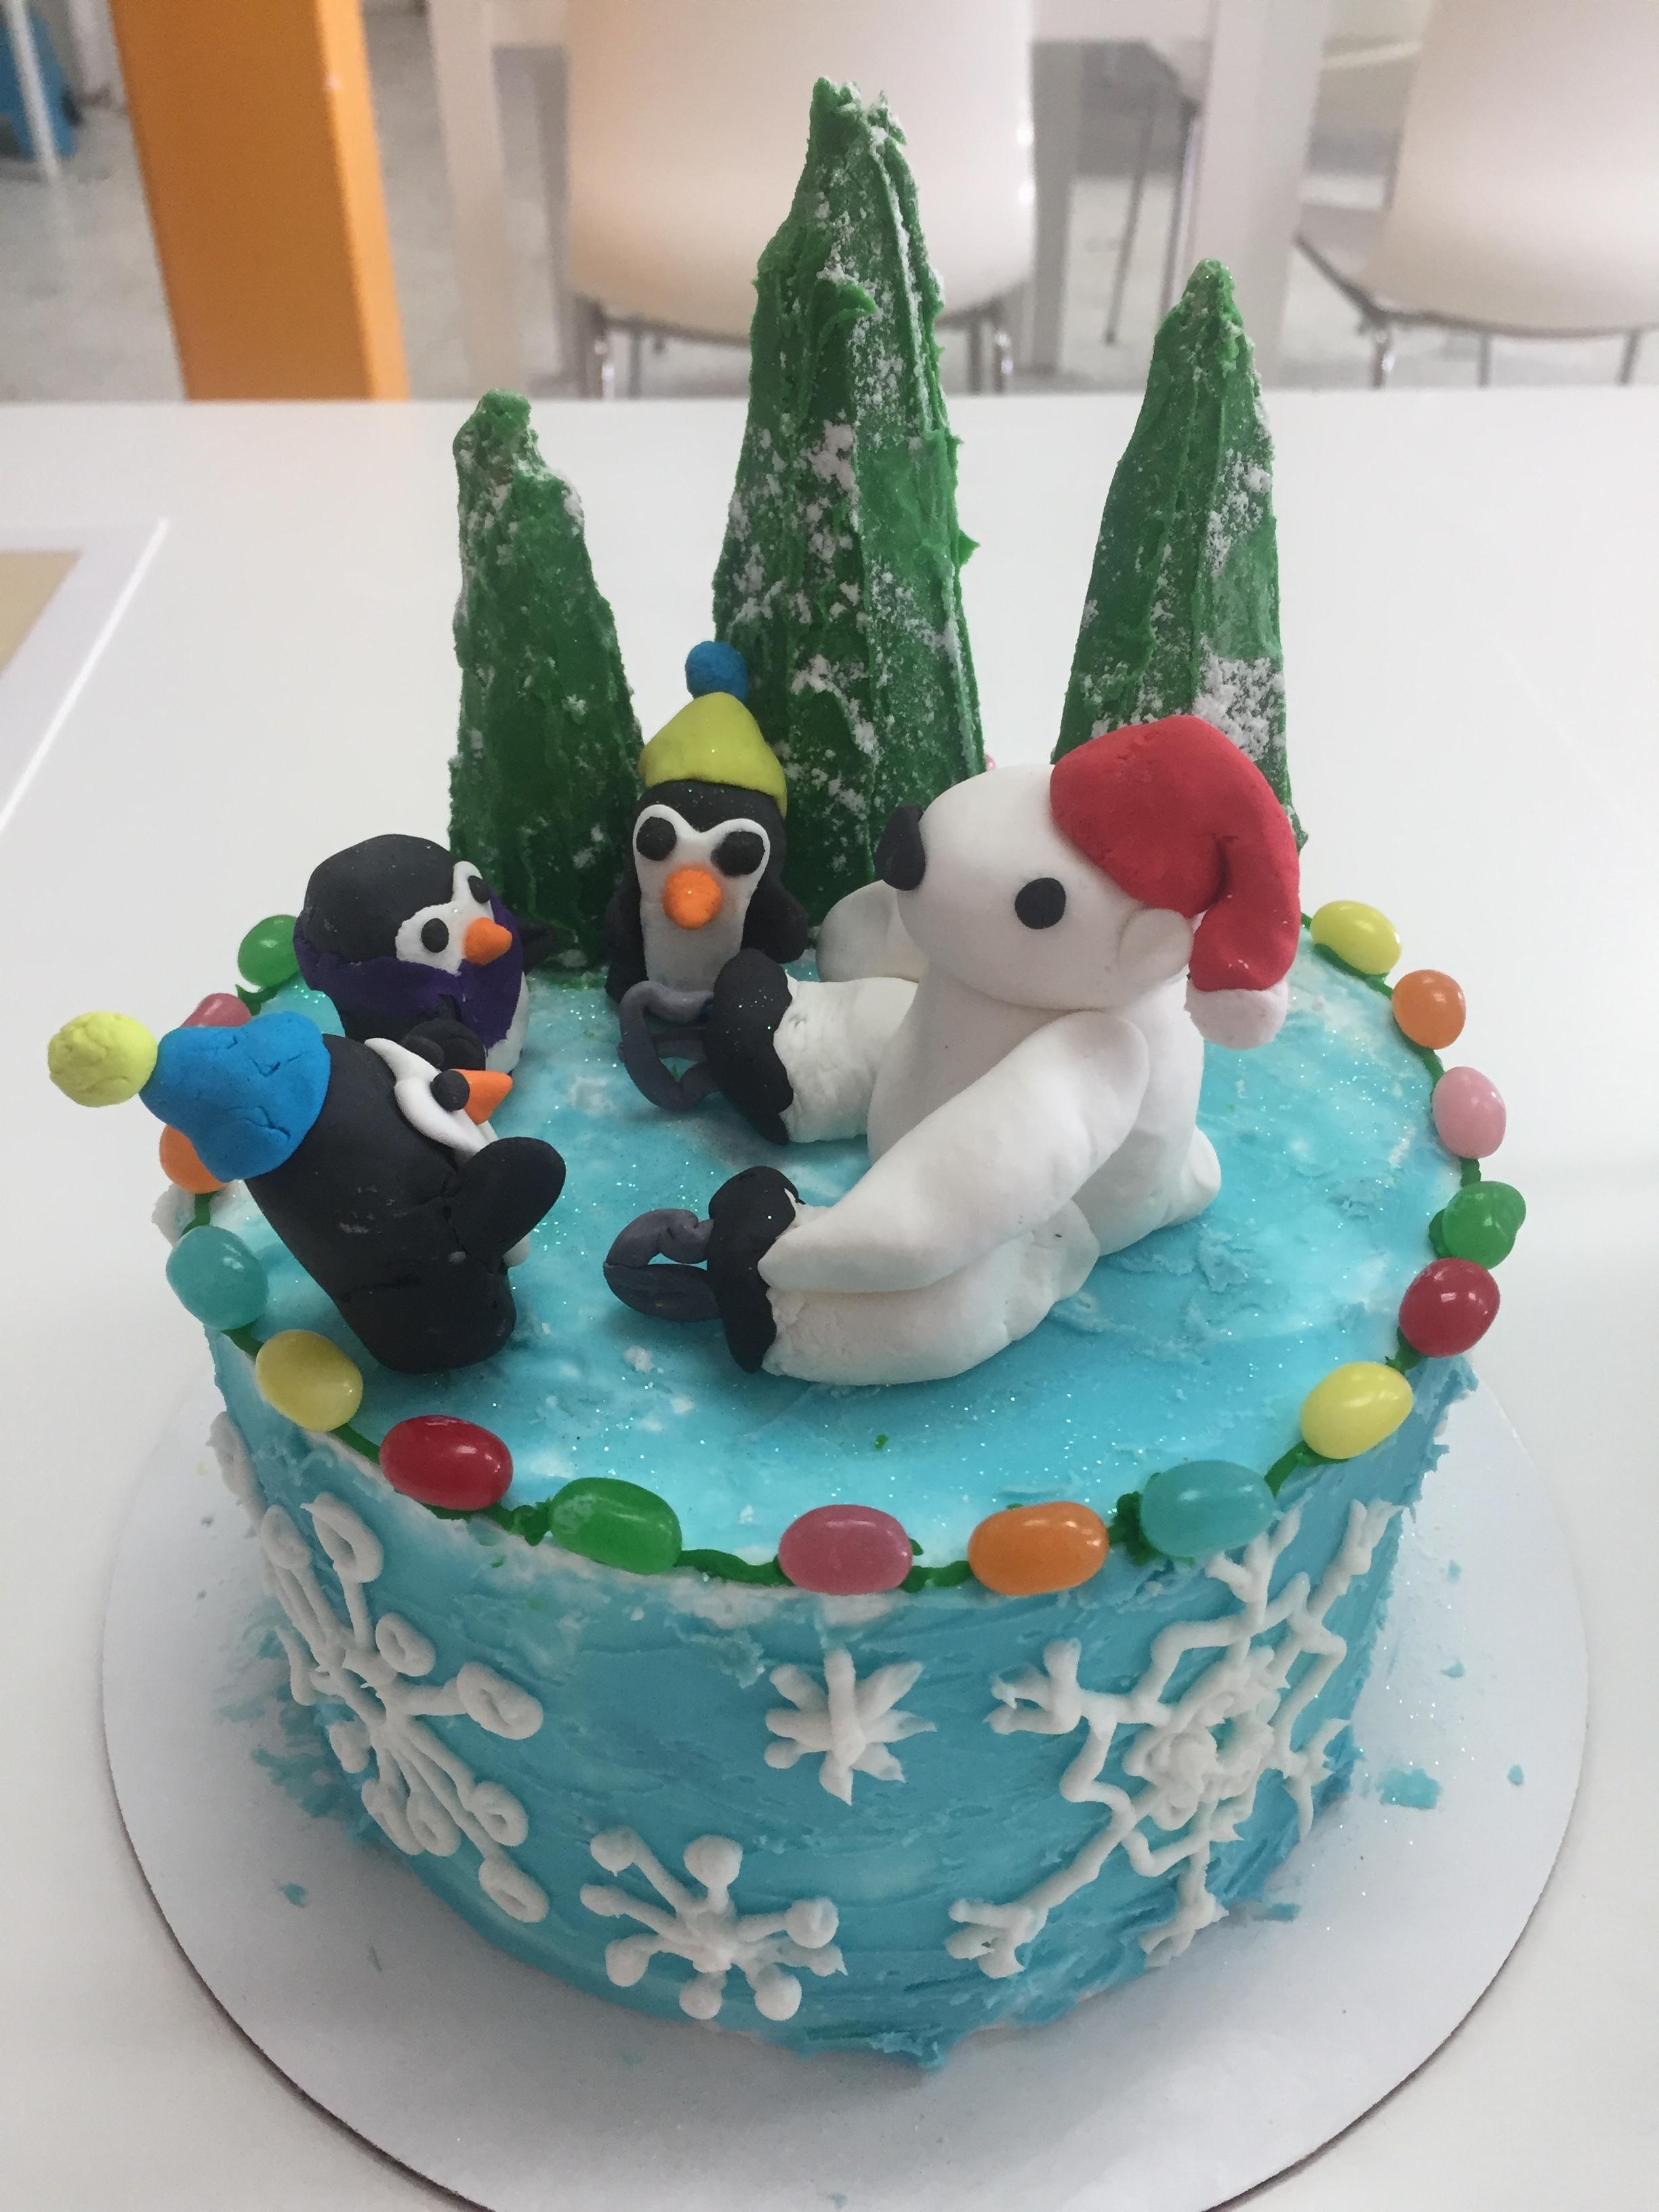 January 26th Cake Class